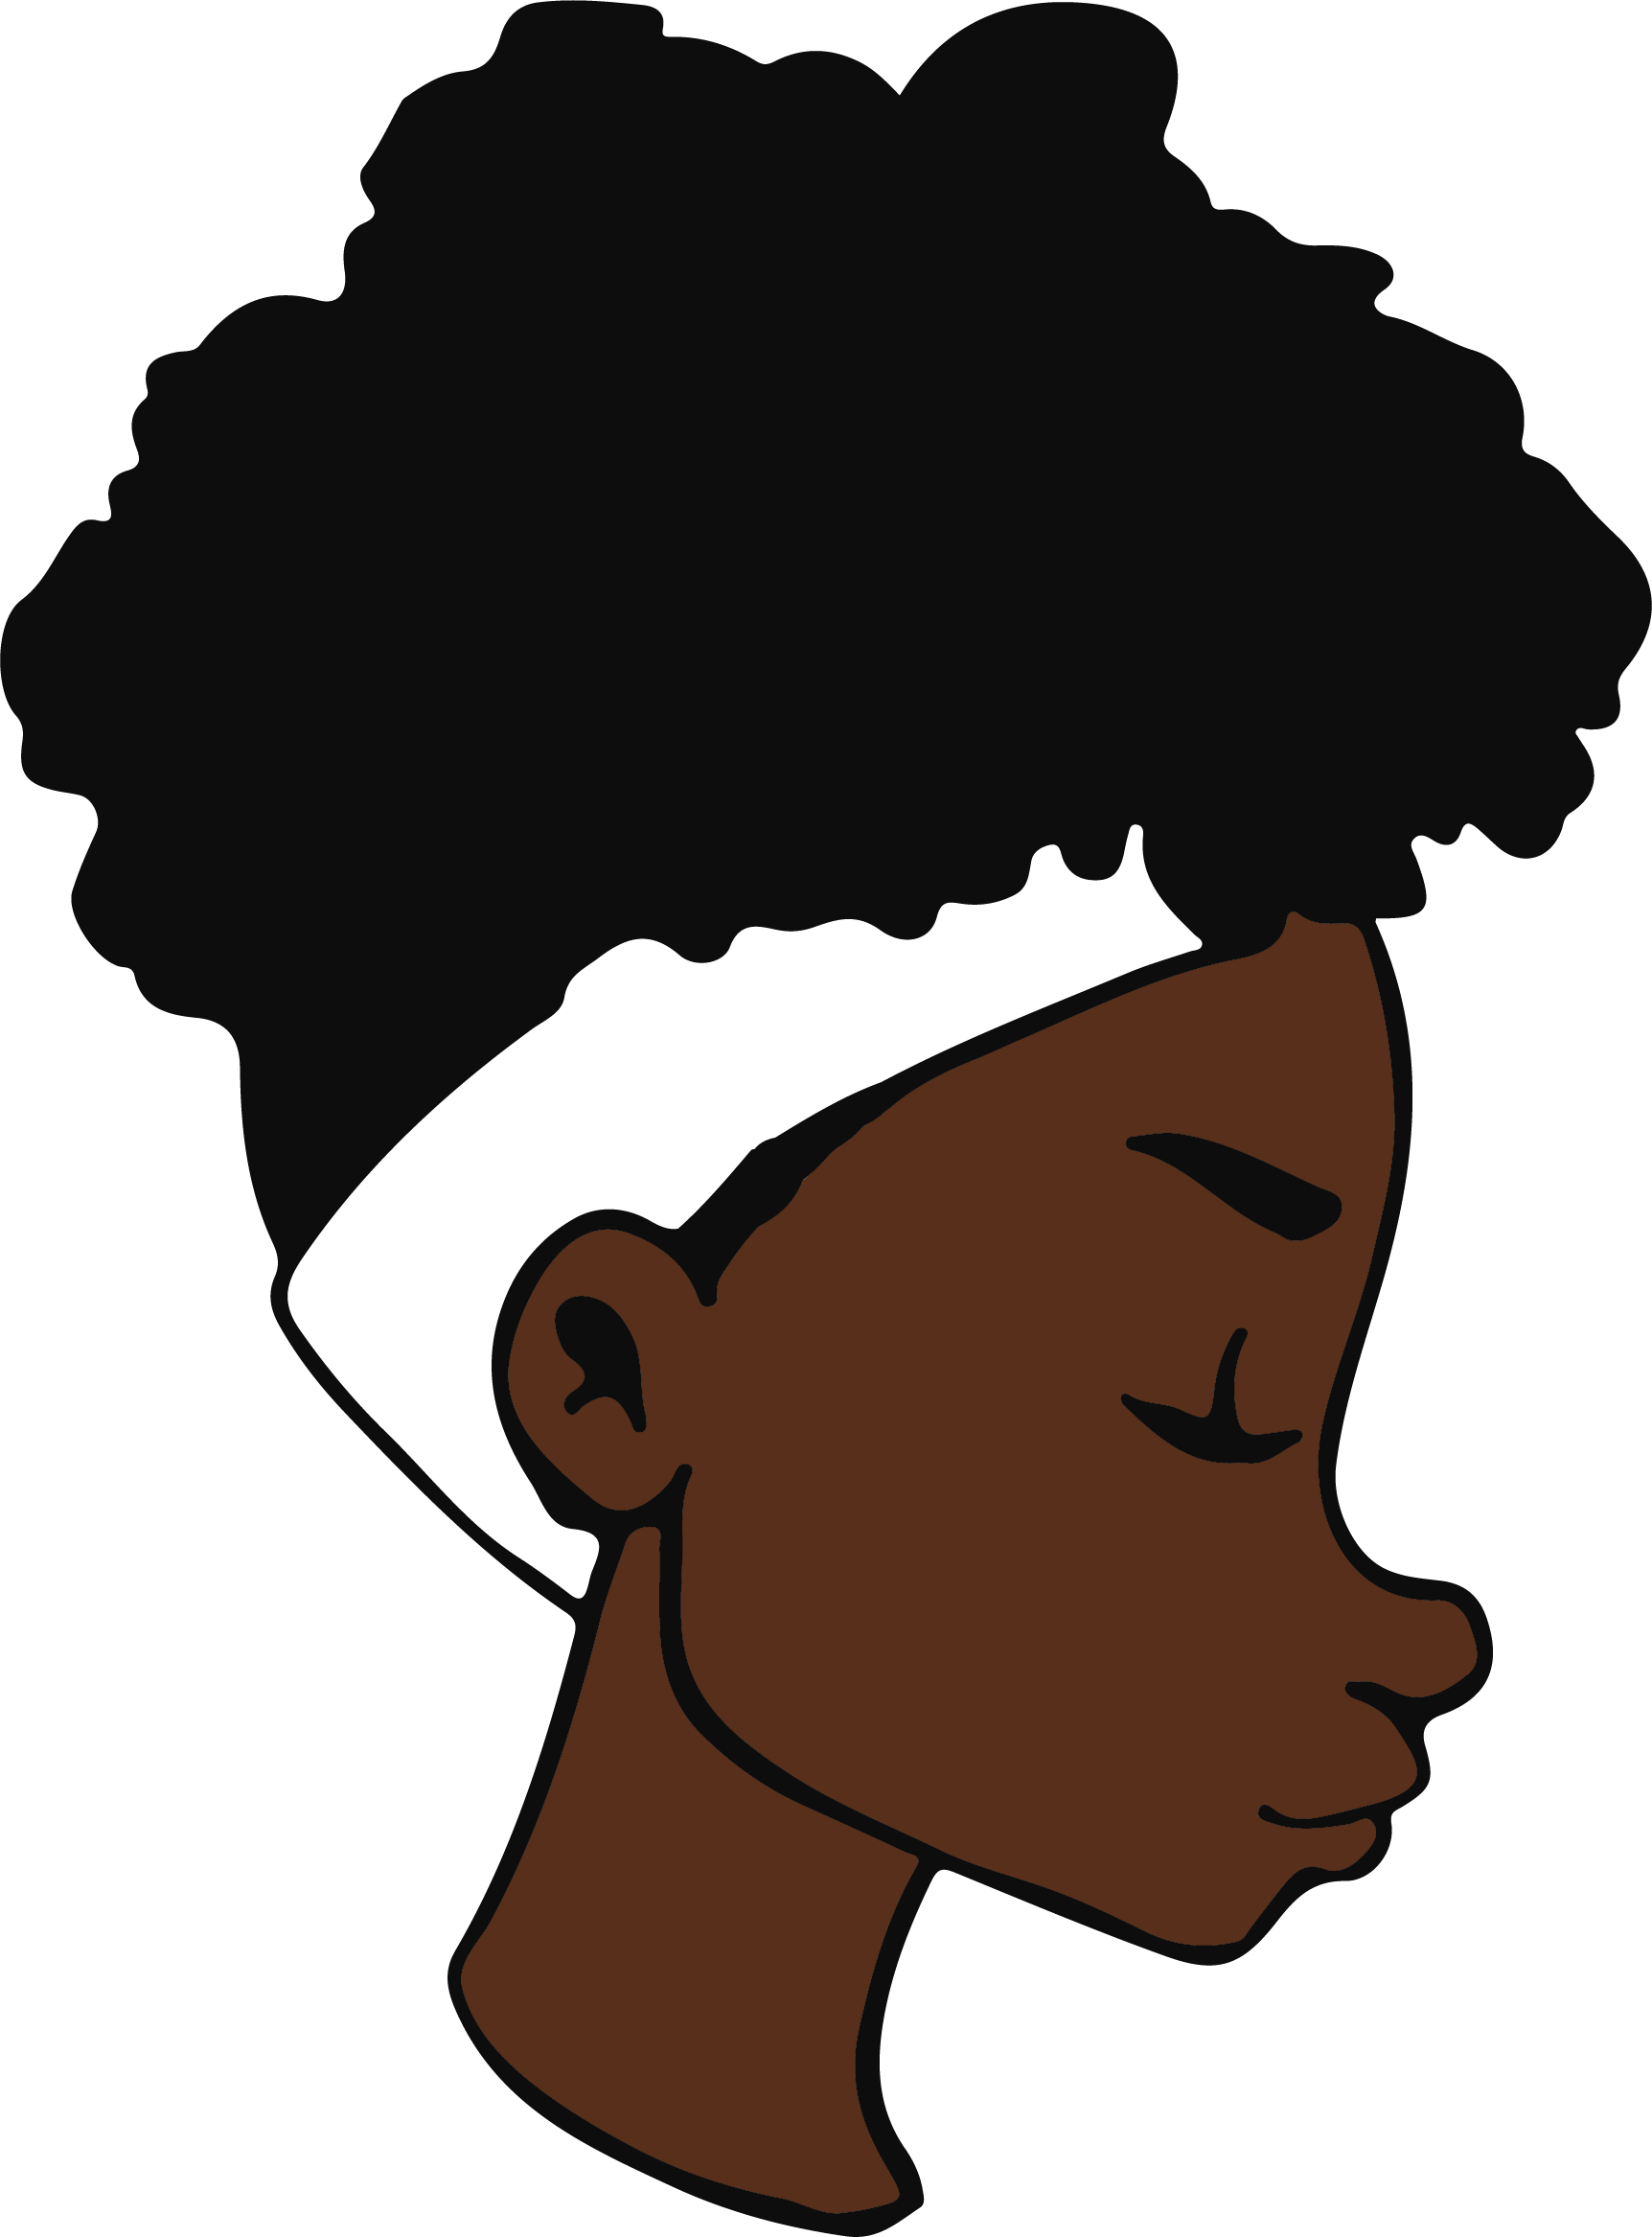 Black woman afro